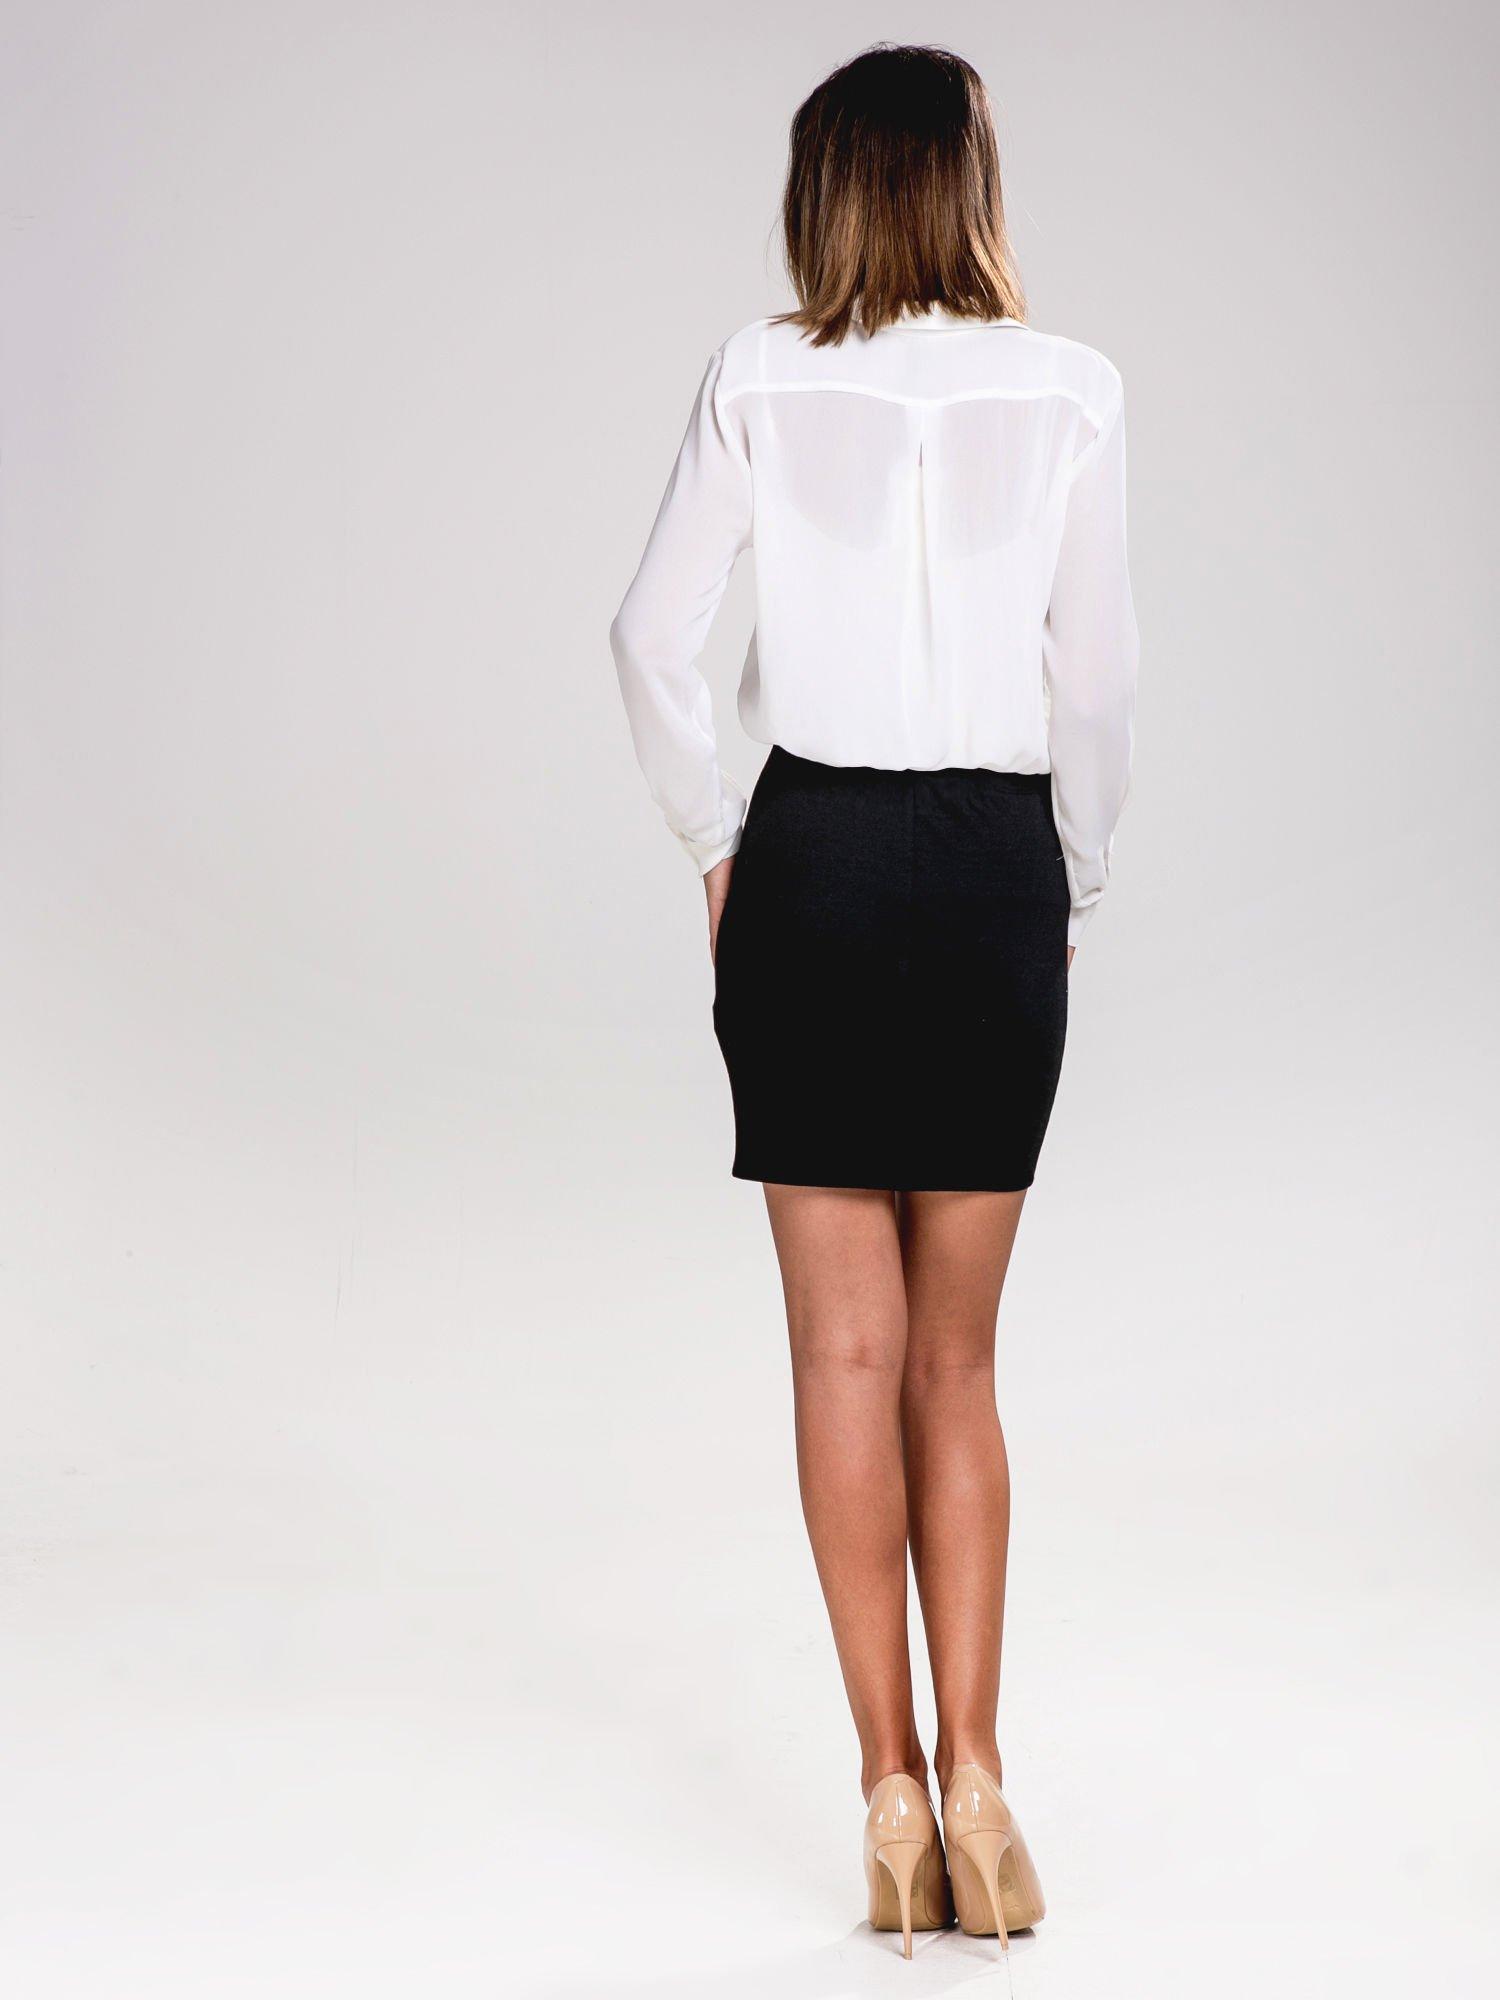 STRADIVARIUS Sukienka dwuczęściowa typu koszula + spódnica                                  zdj.                                  2